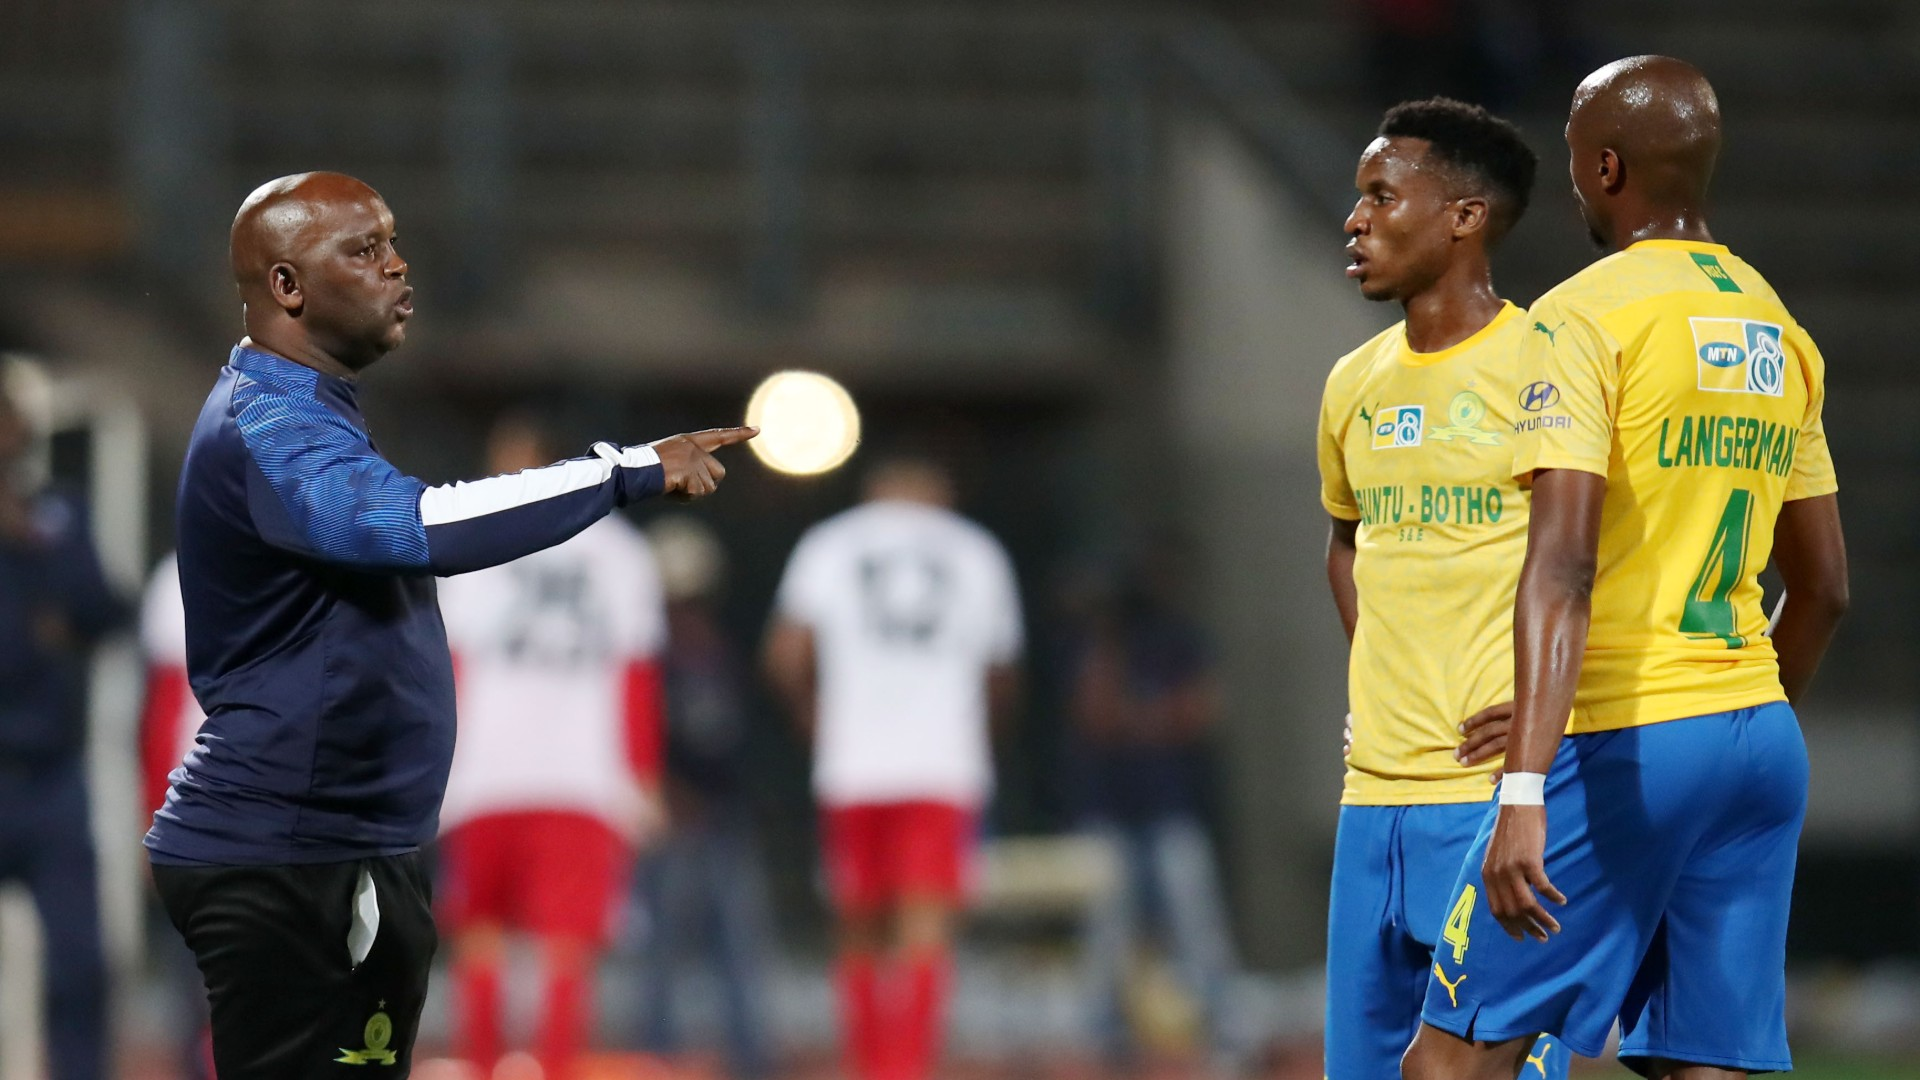 Pitso Mosimane Themba Zwane Tebogo Langerman - Mamelodi Sundowns August 2020